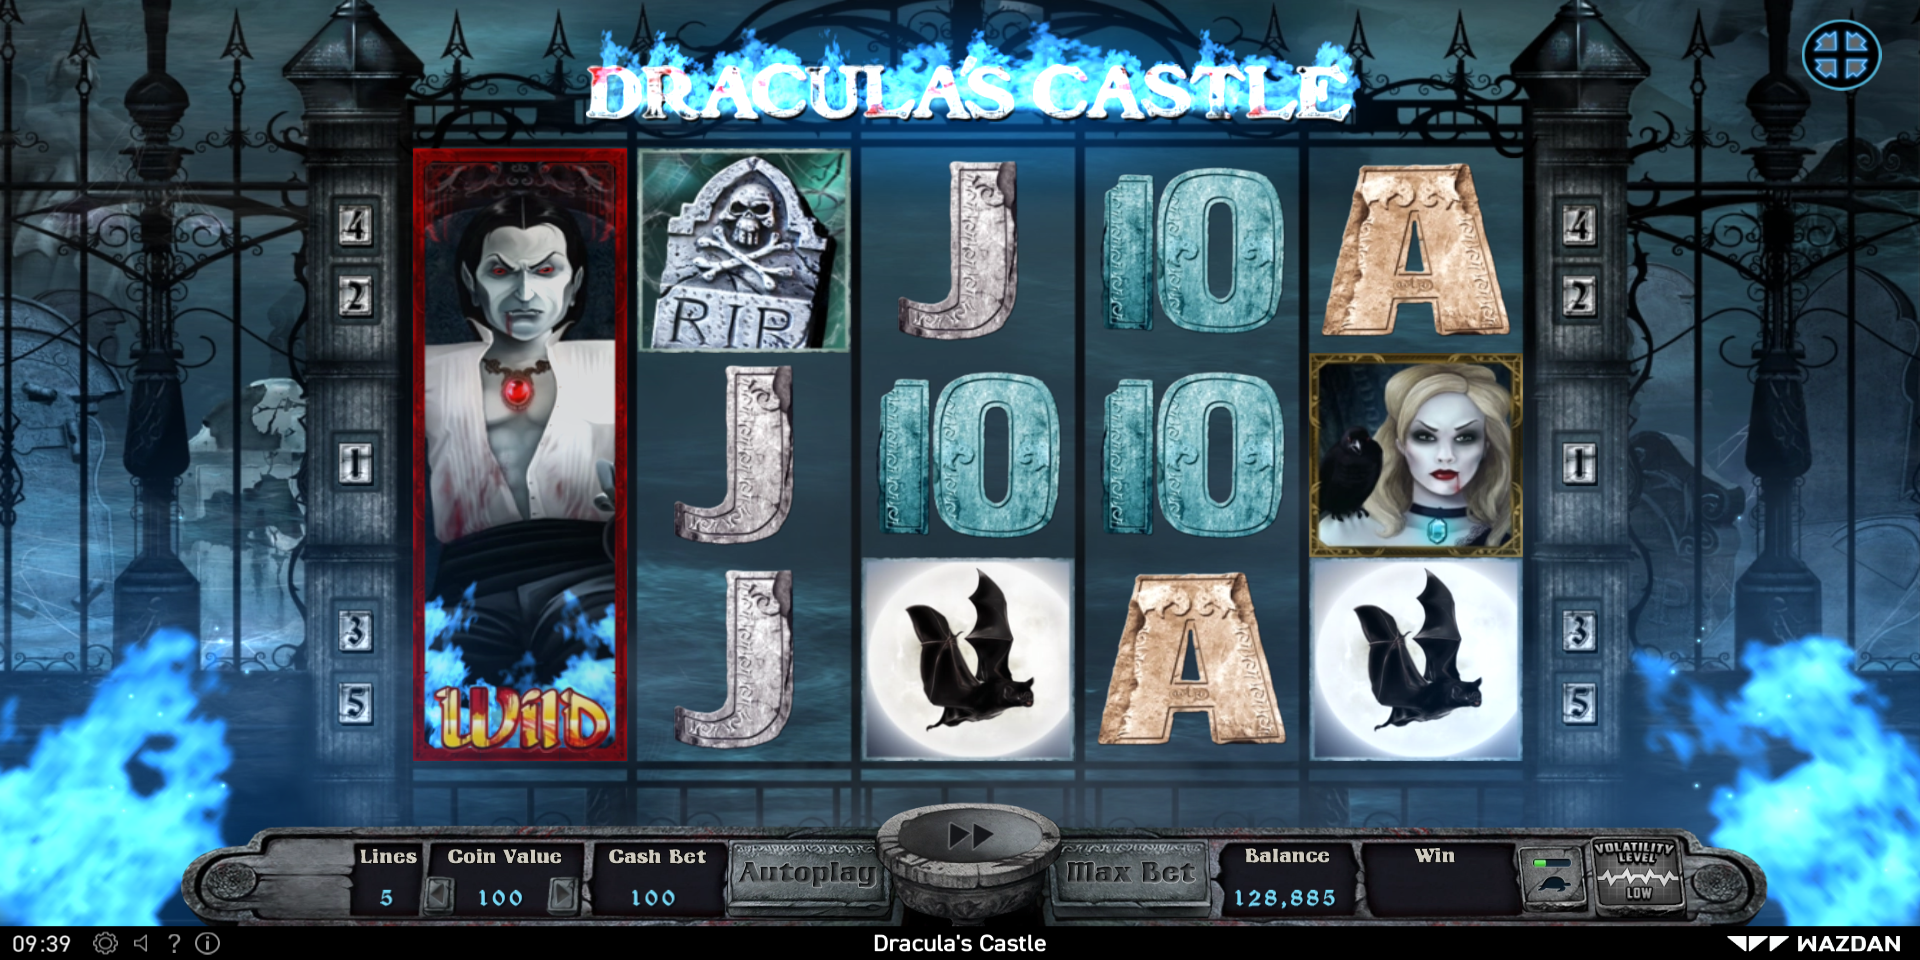 Wazdan Casinos Release New Draculas Castle Slot